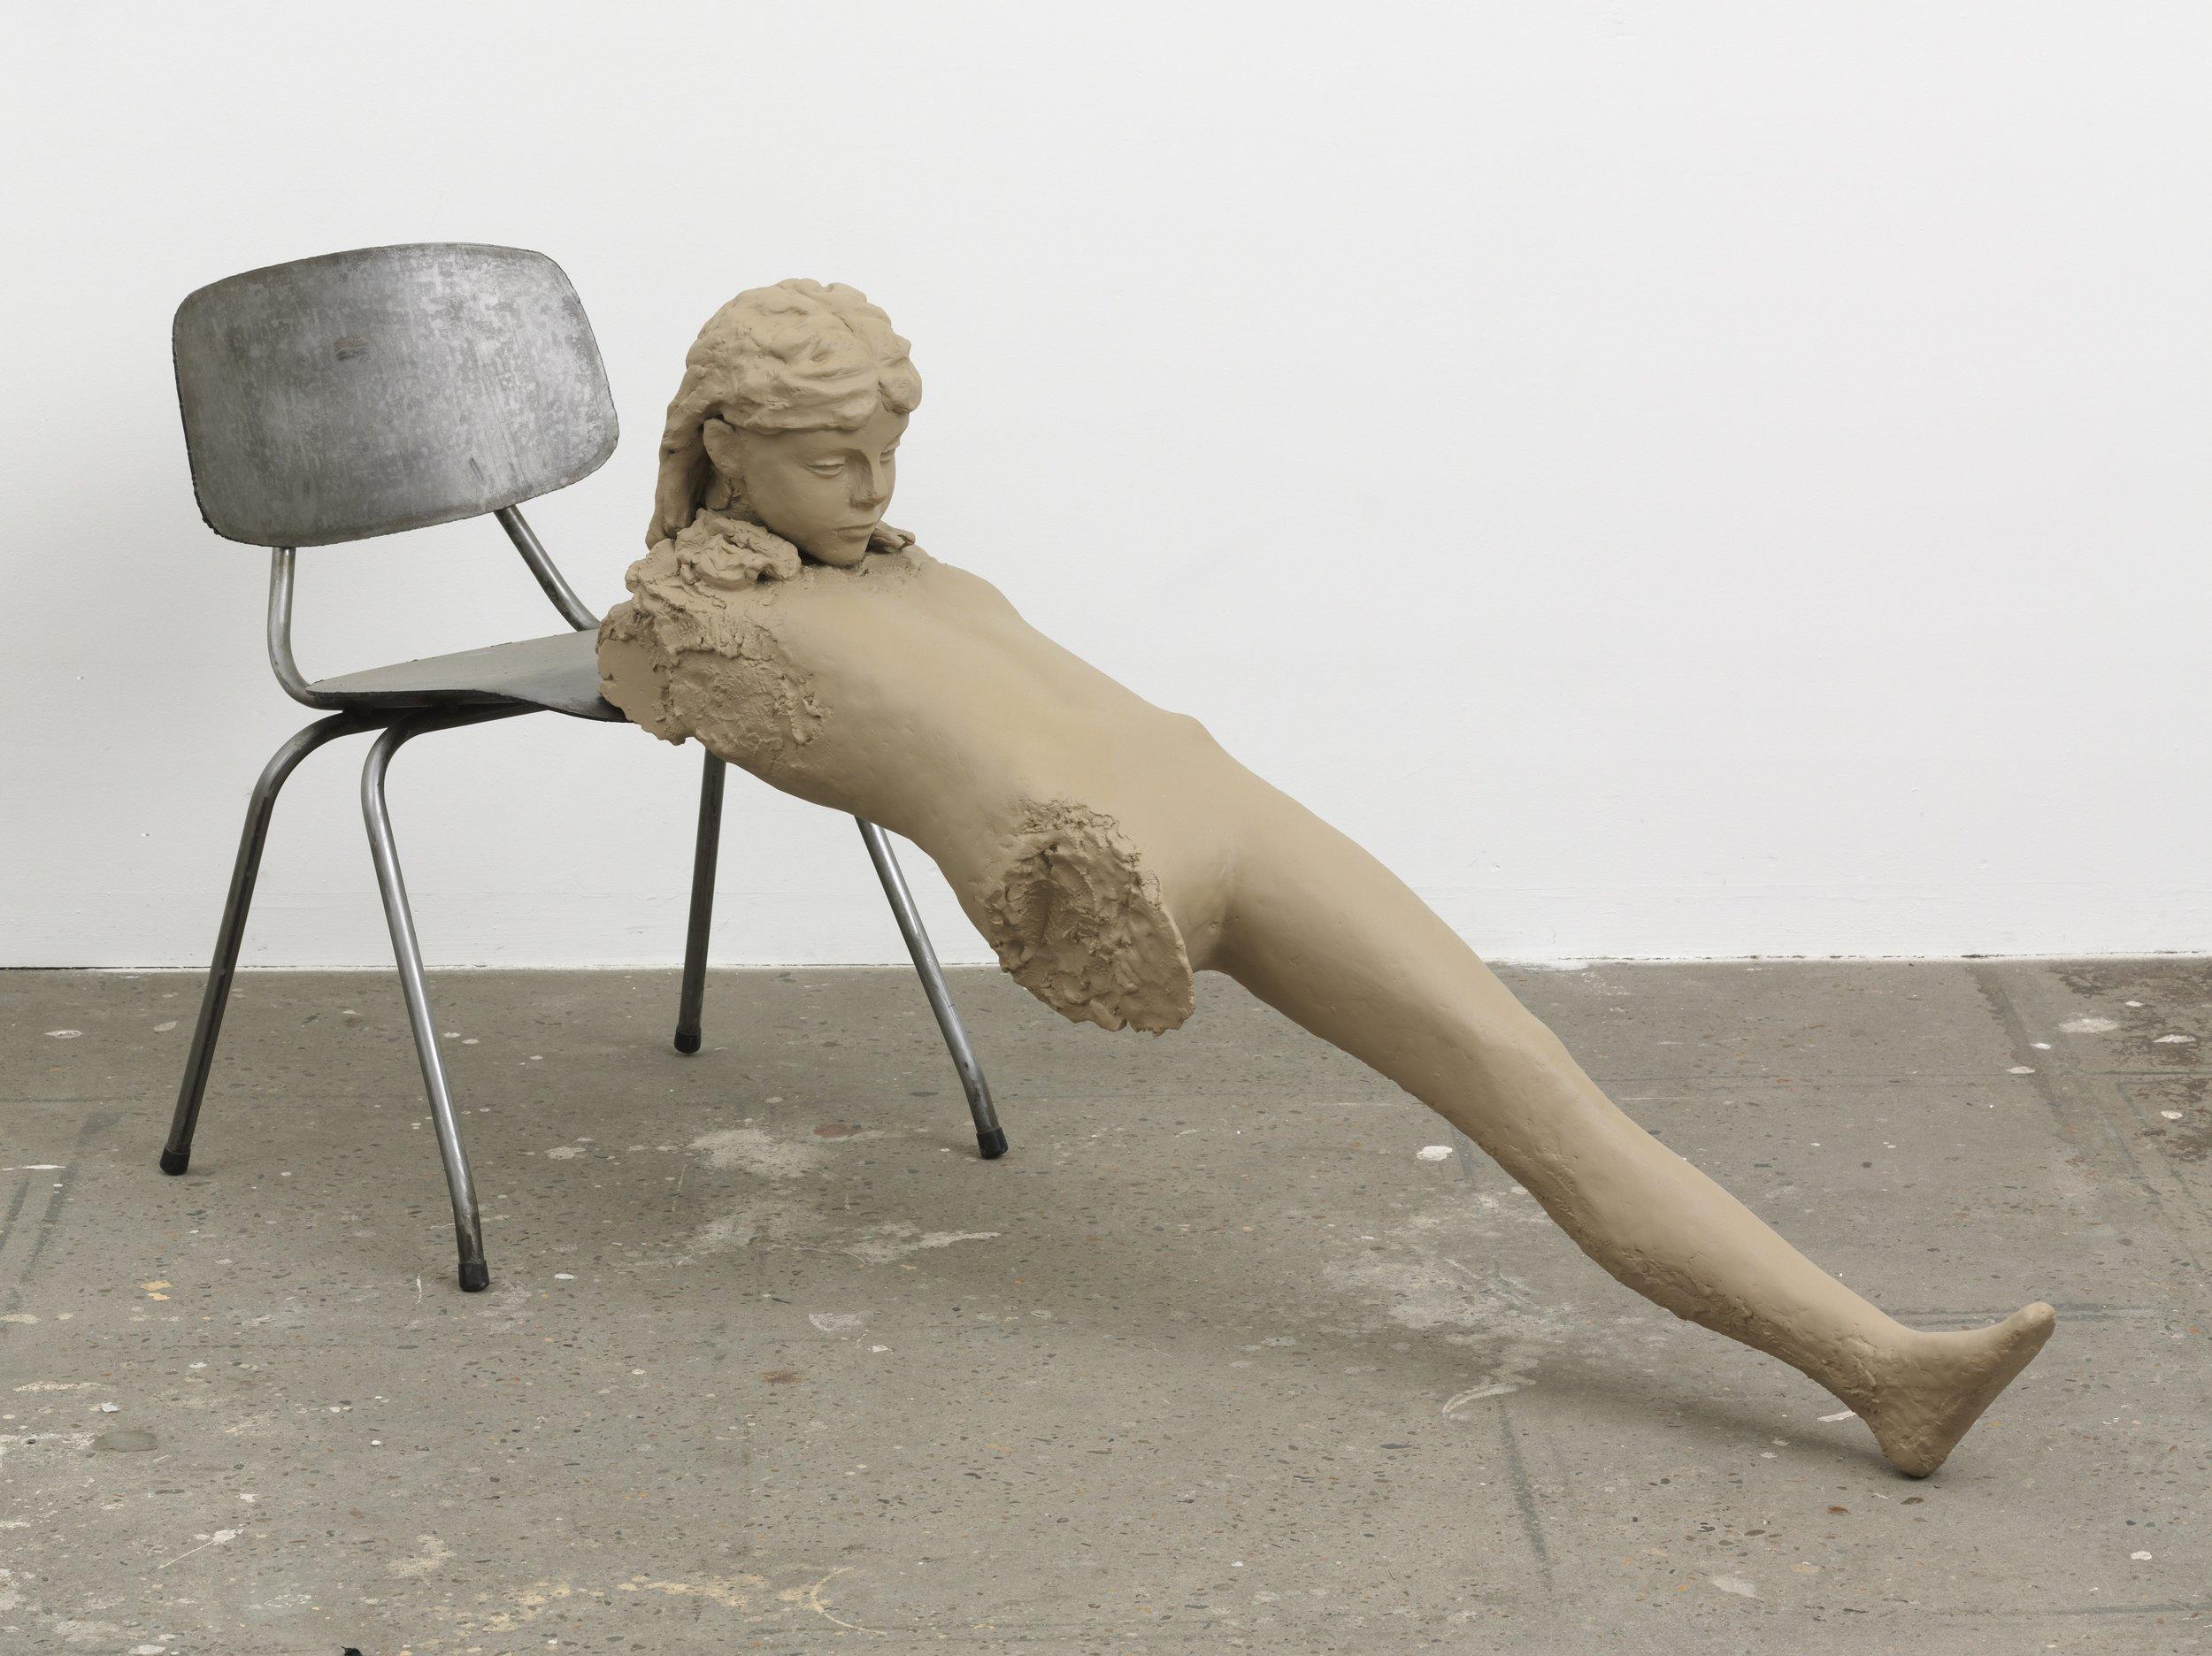 Mark Manders, Clay Figure with Iron Chair, 2009, 81 x 177 x 59 cm, Courtesy Zeno X Gallery